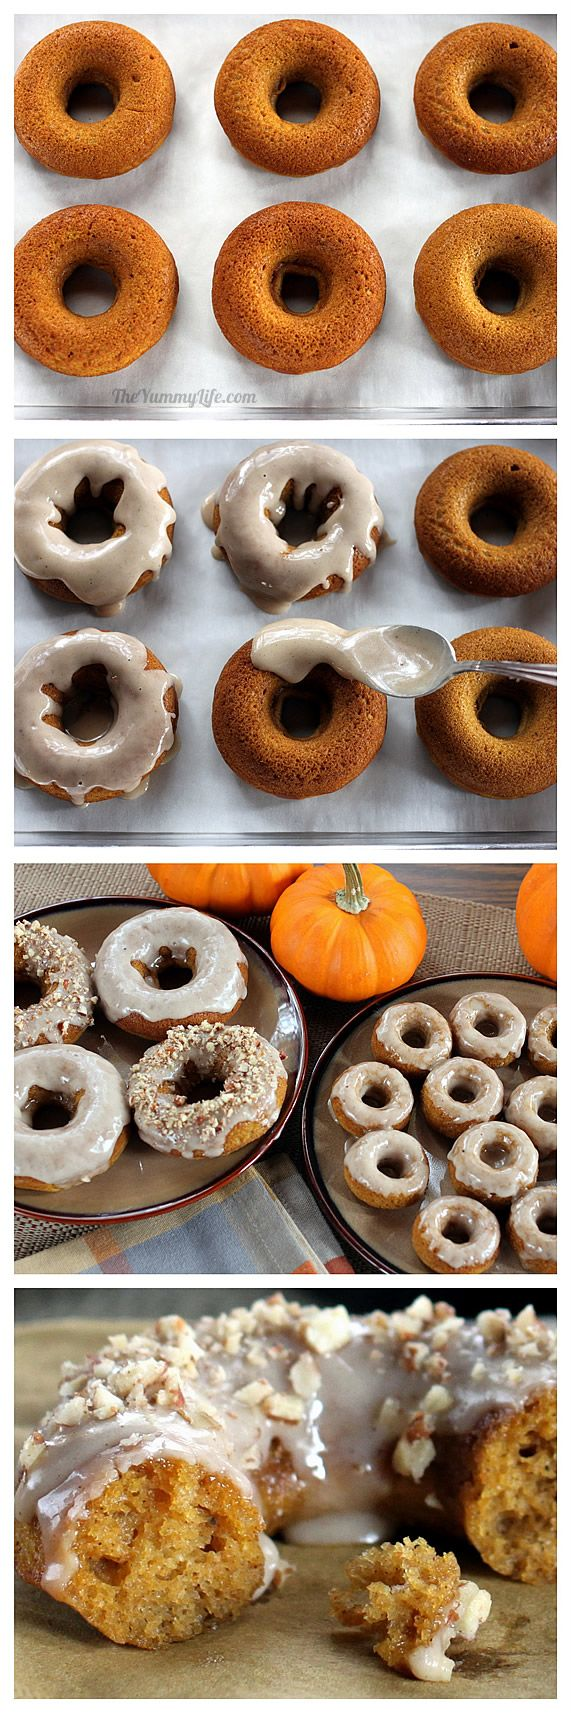 donuts7.jpg